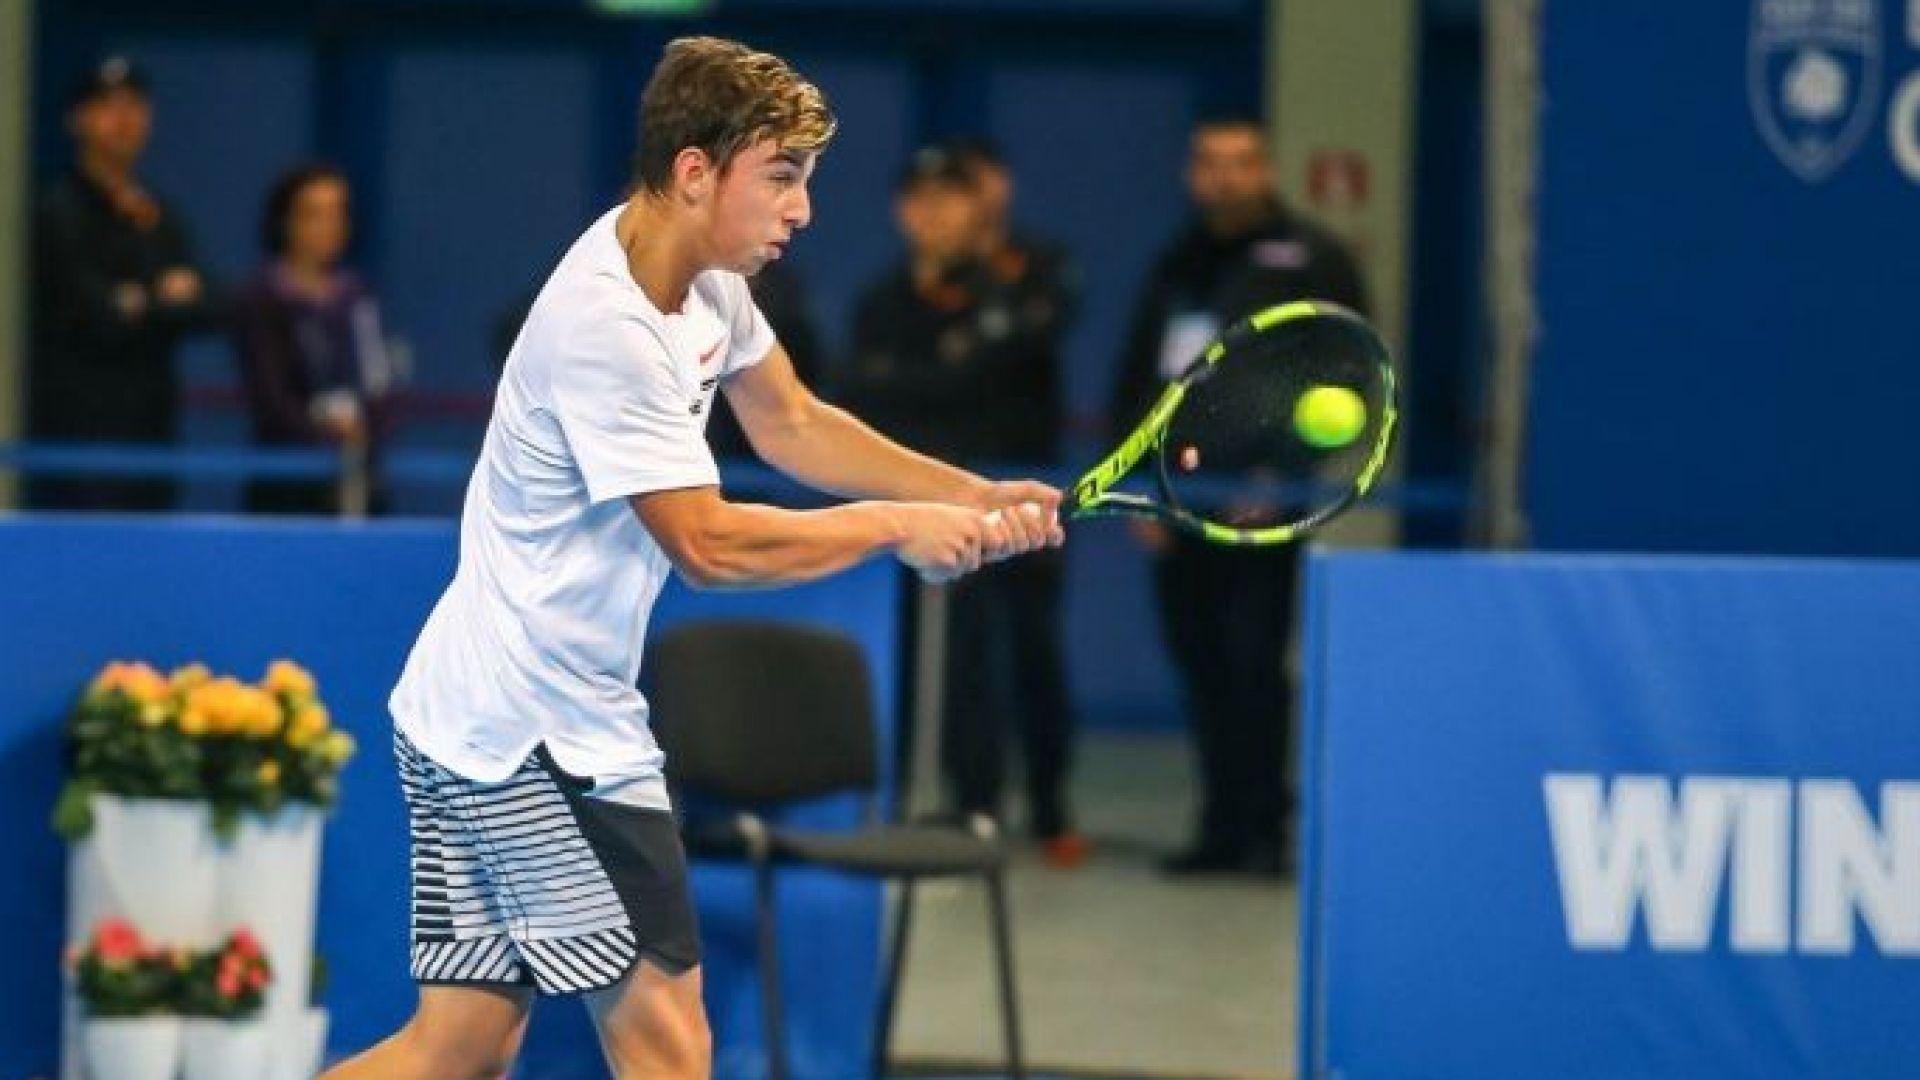 Българин ще играе полуфинал на US Open